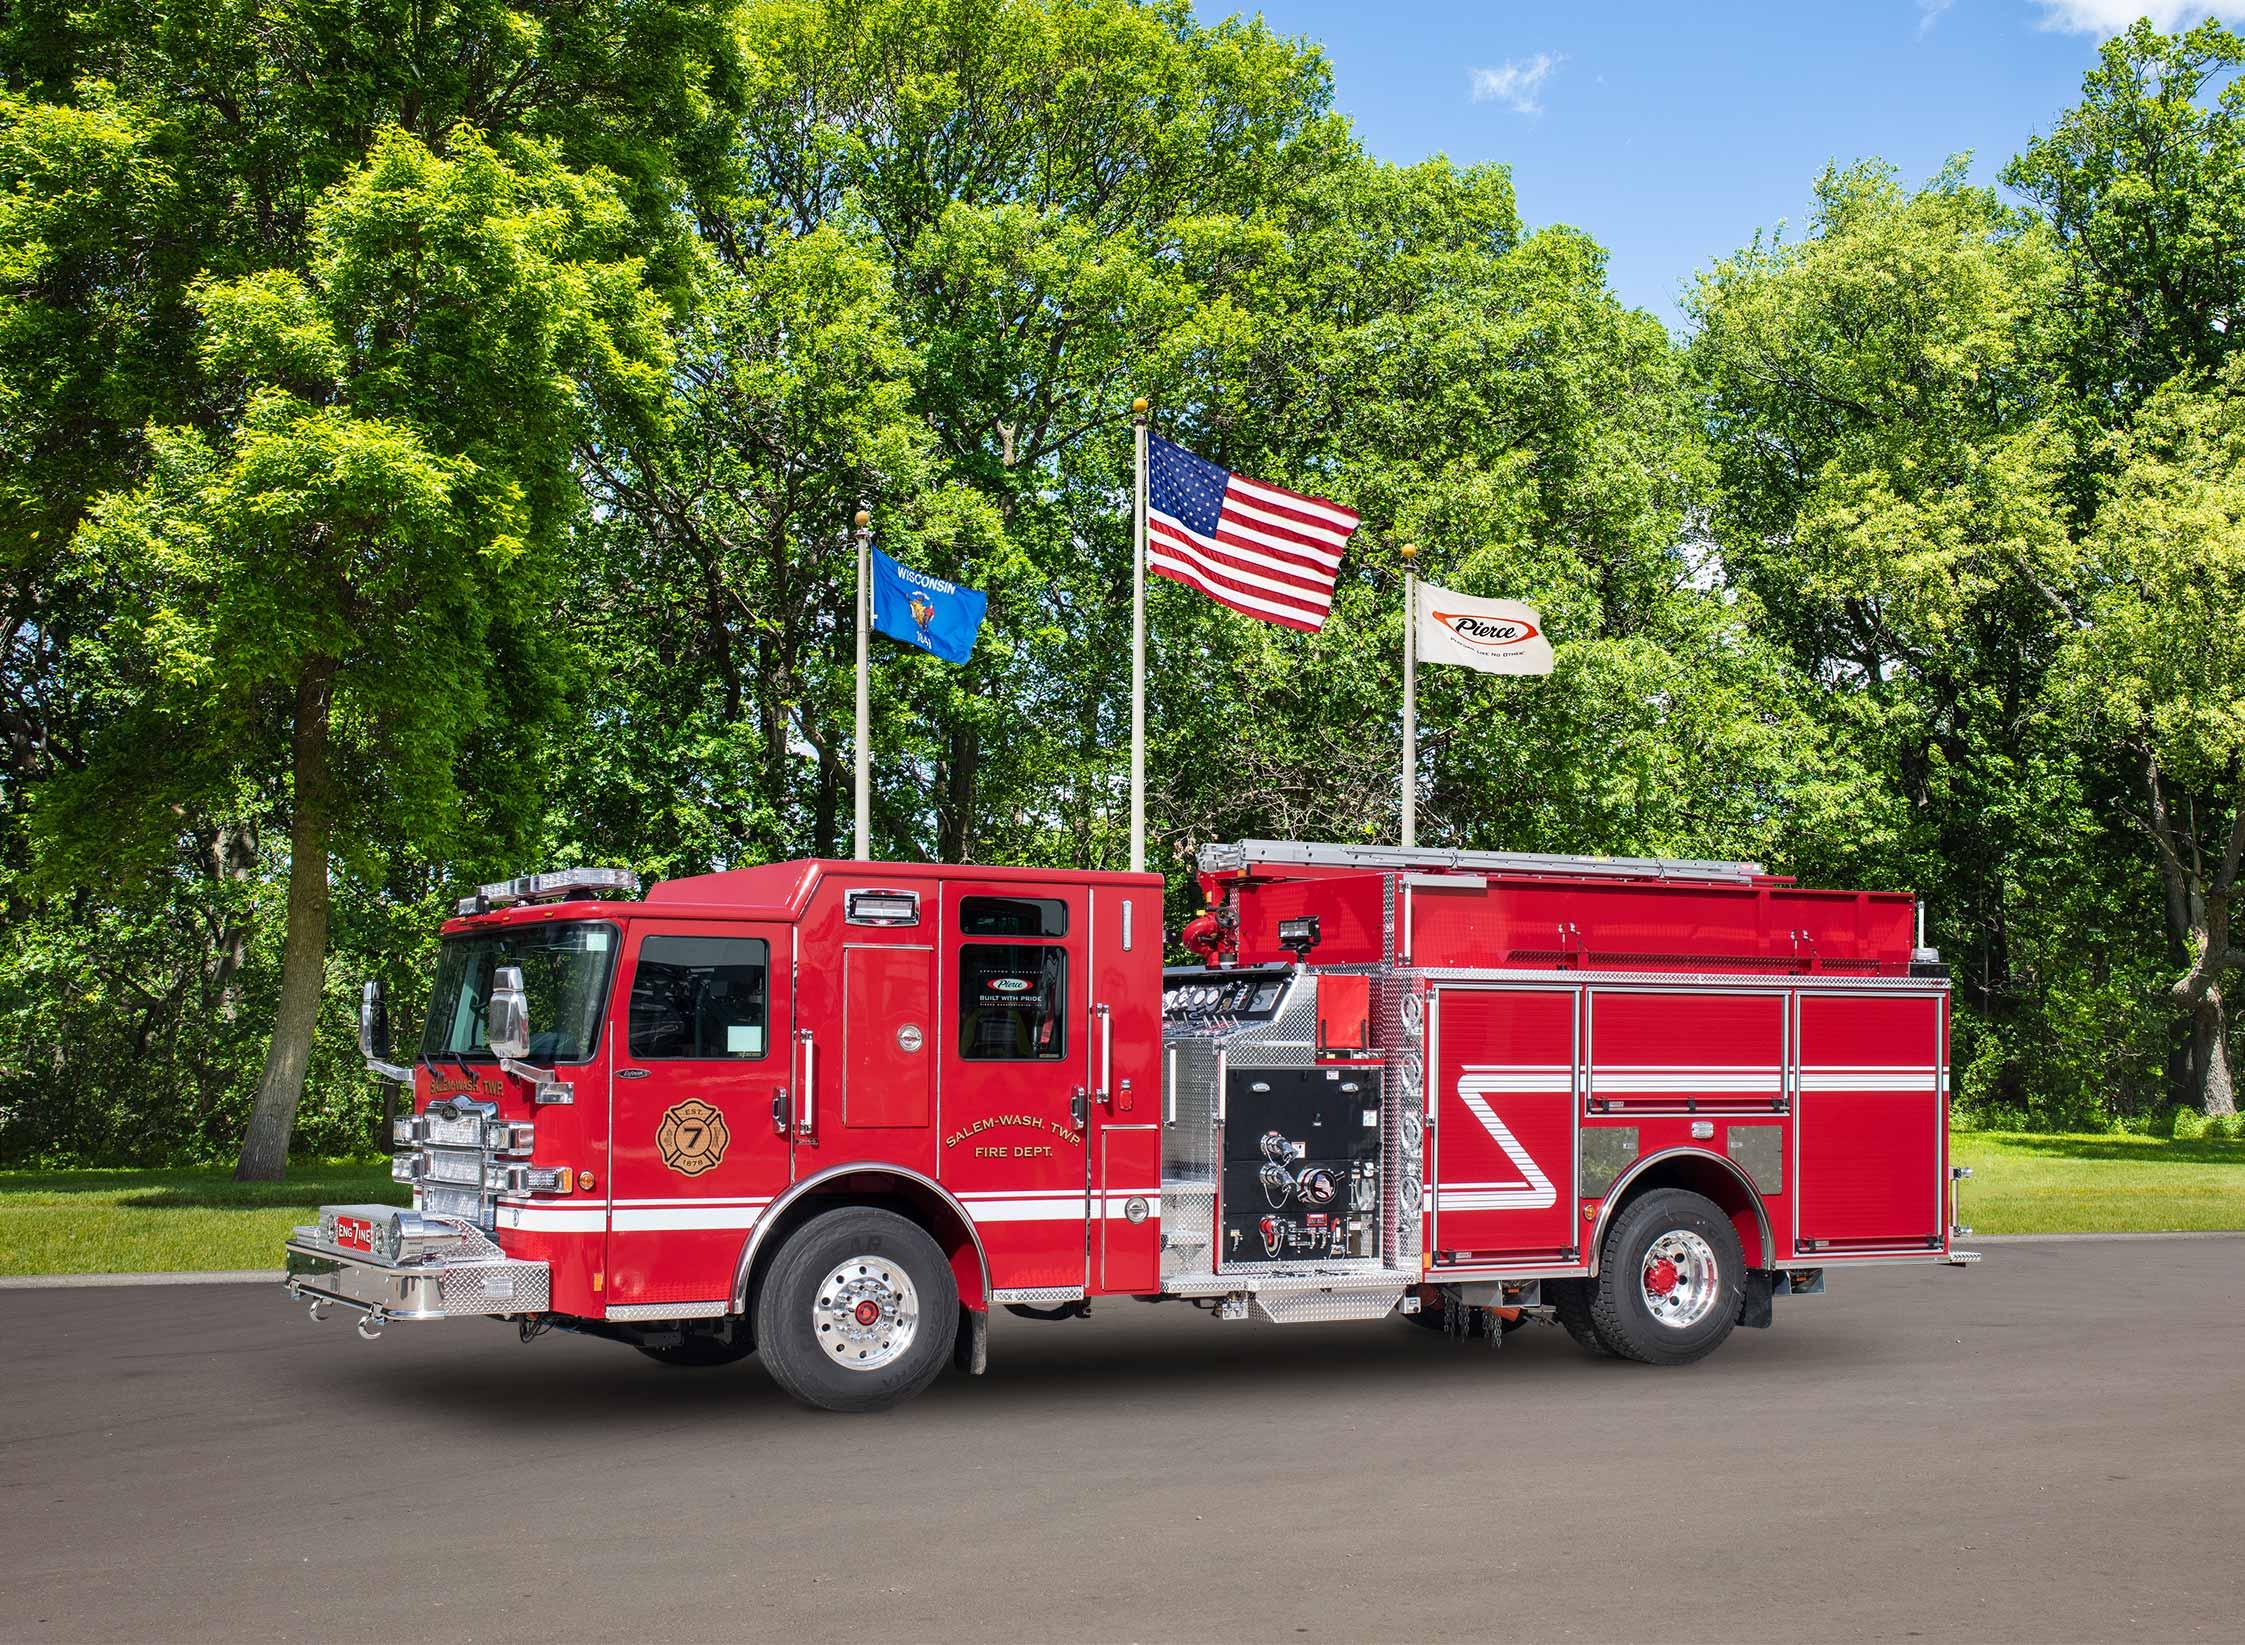 Washington Township Fire Department - Pumper